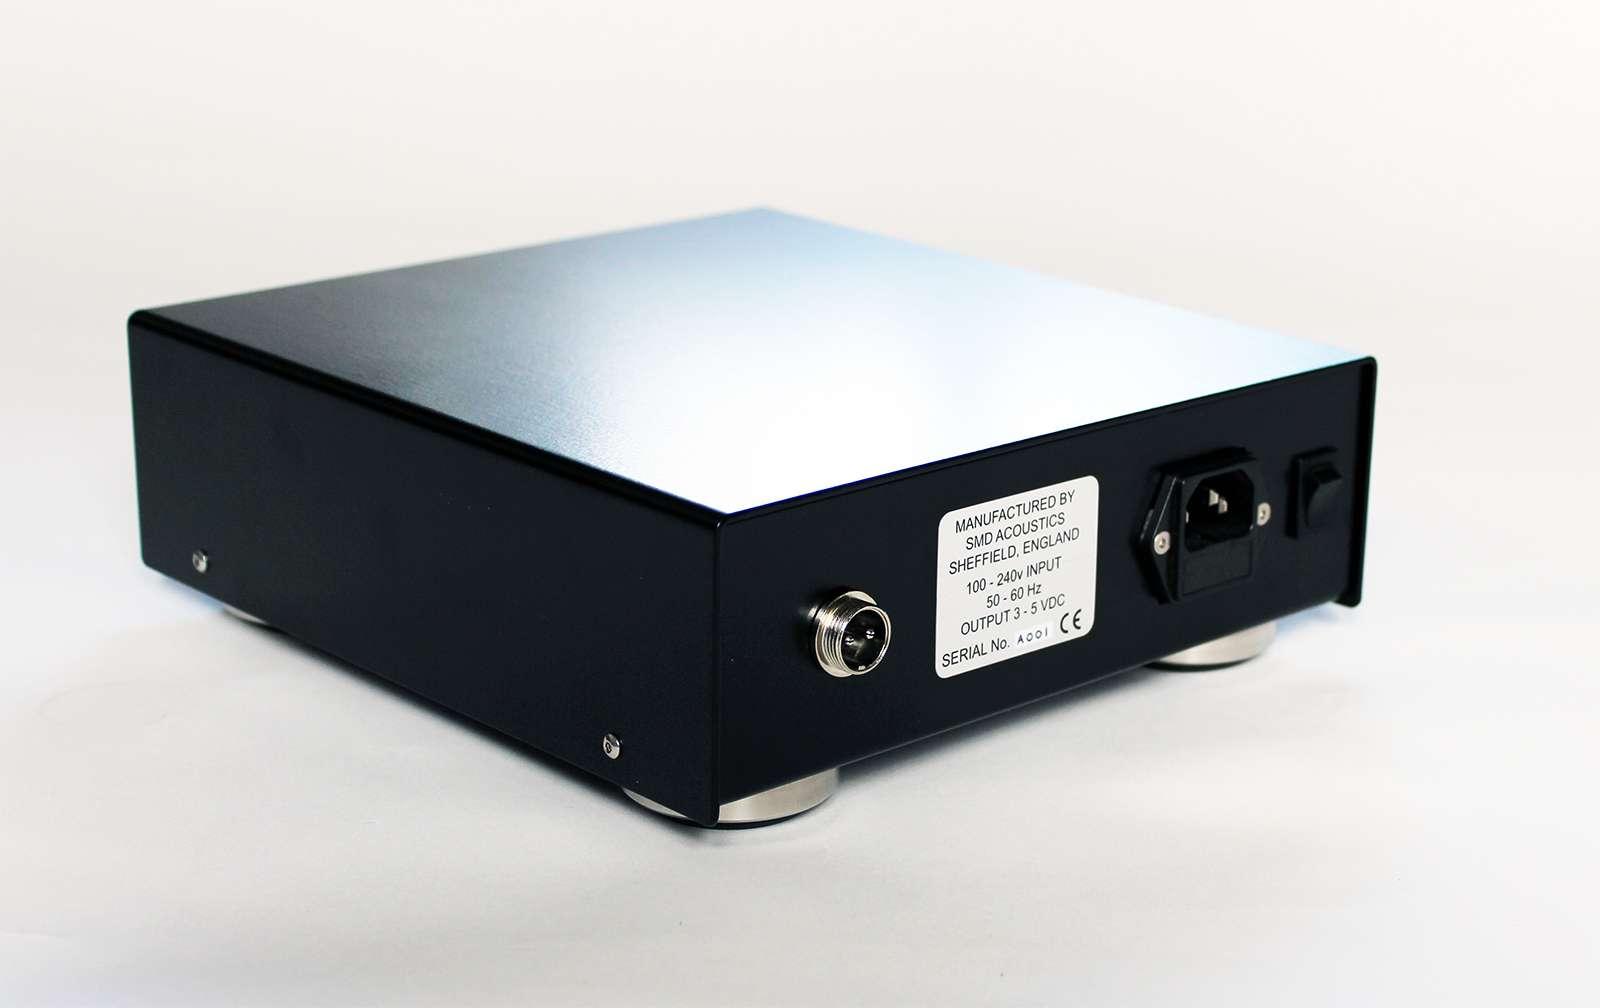 SMD Acoustics V2 0 Turntable